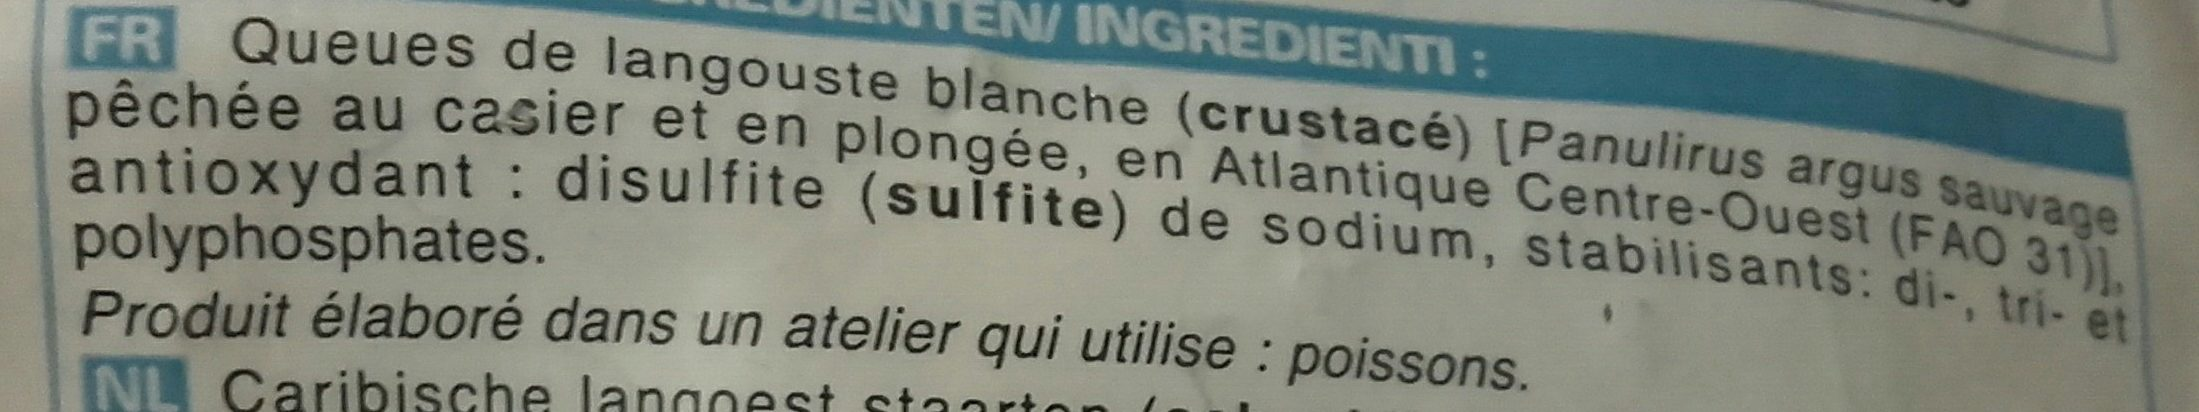 2 Queues de Langouste Blanche Crues - Ingredients - fr